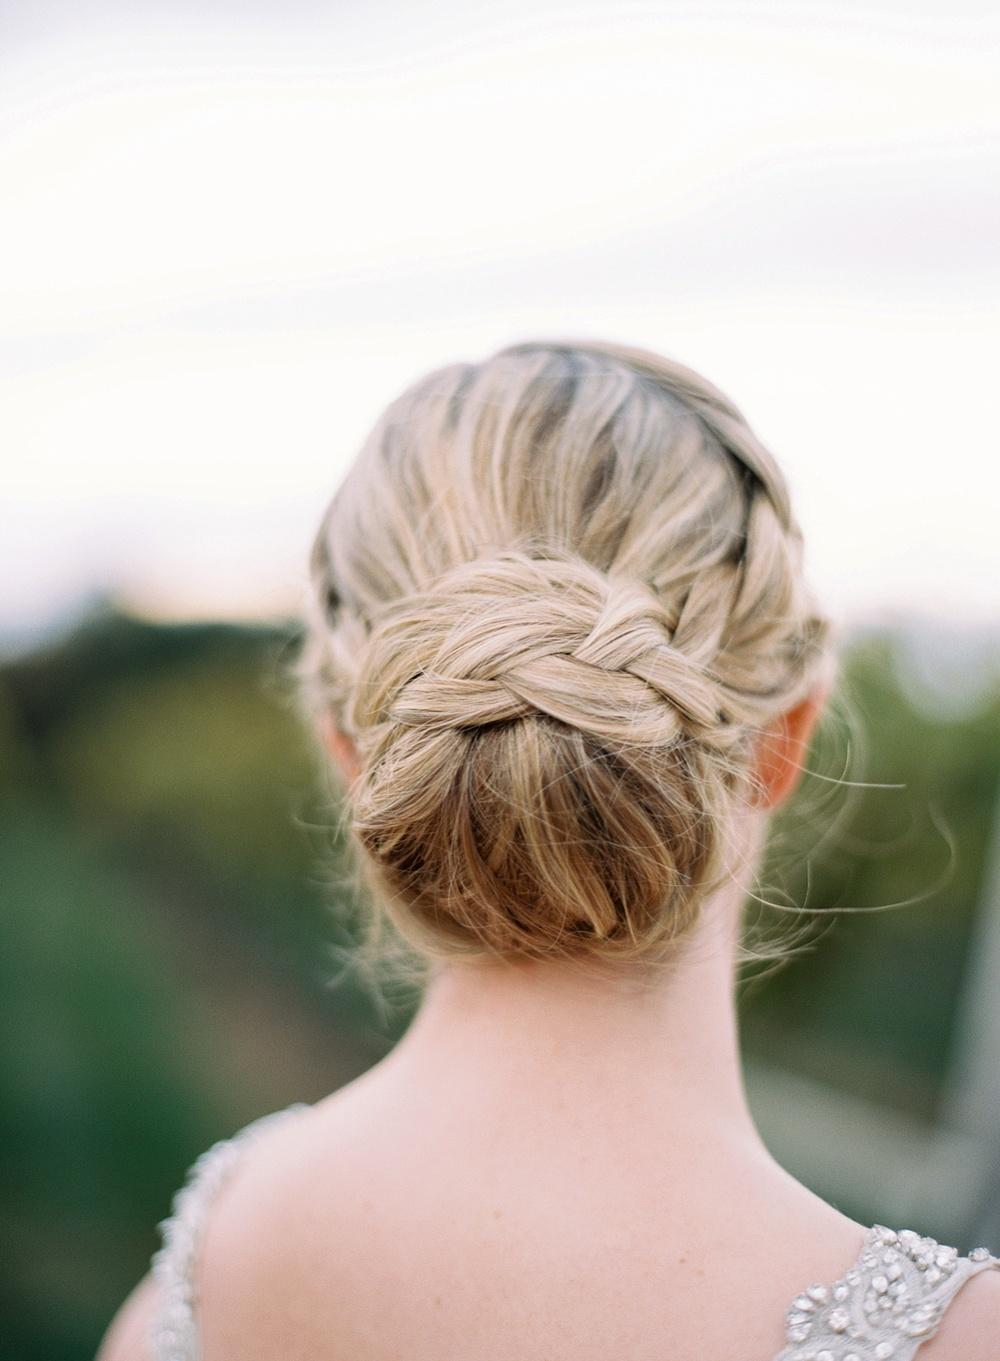 wedding-bride-hair-style-braid-bun